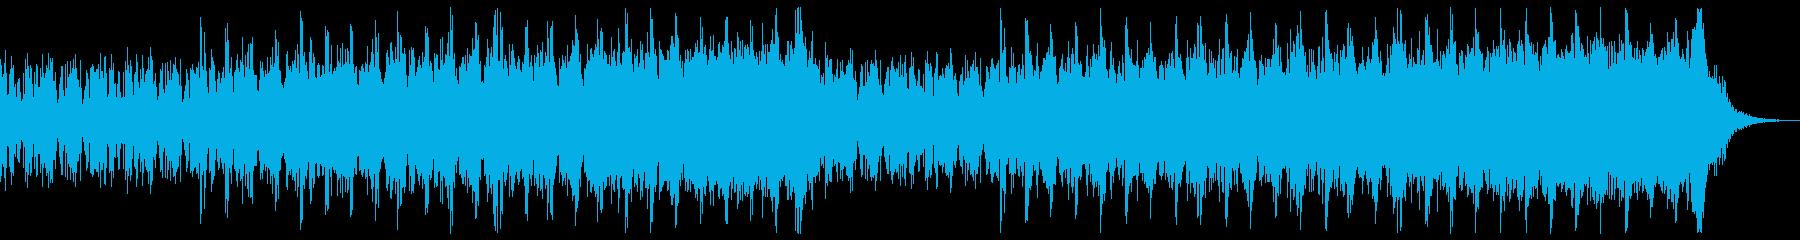 Cinematic Orchestra Escape Pinch's reproduced waveform